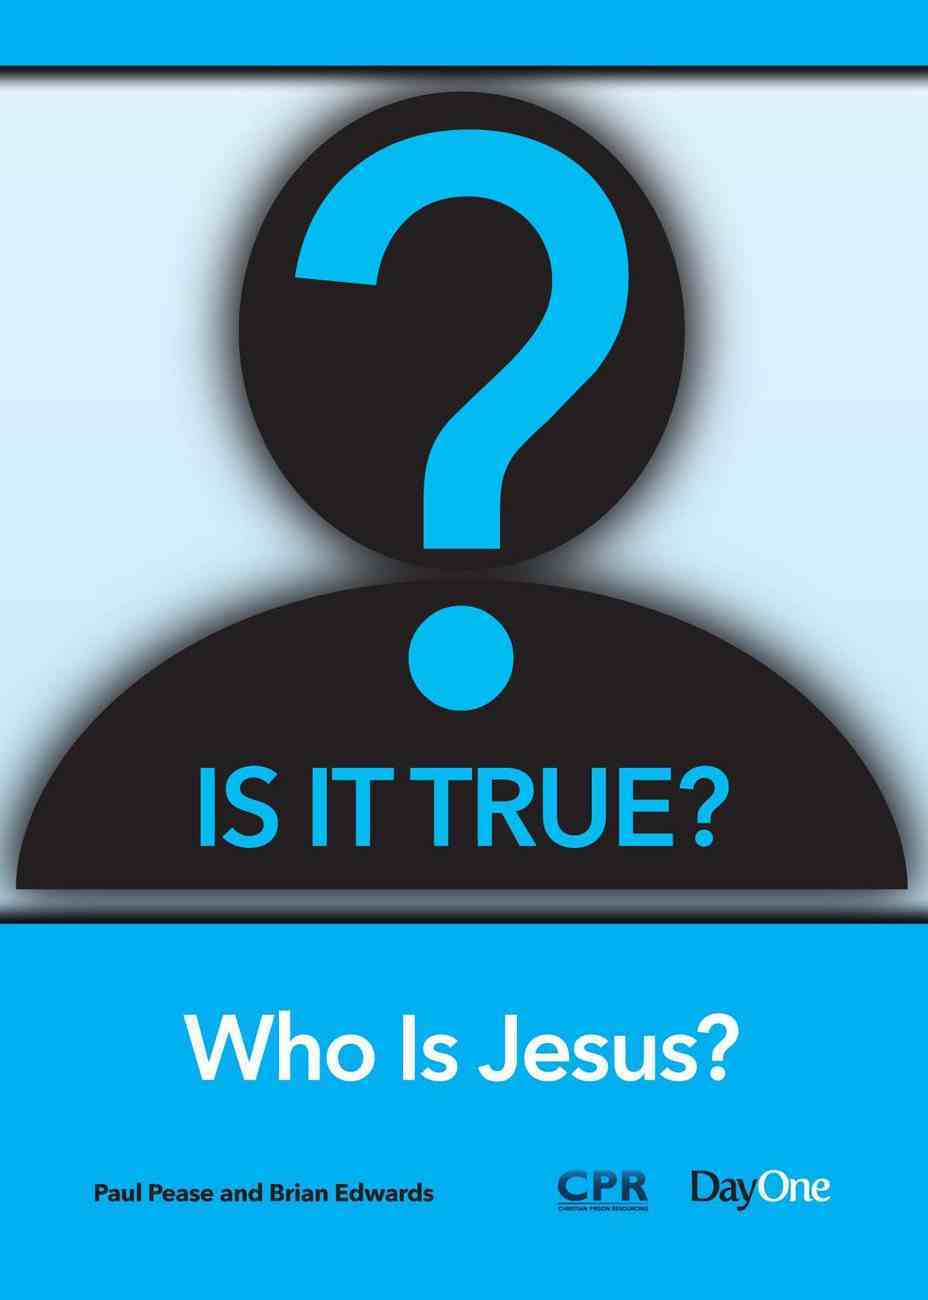 Who is Jesus? (Is It True? Series) Booklet